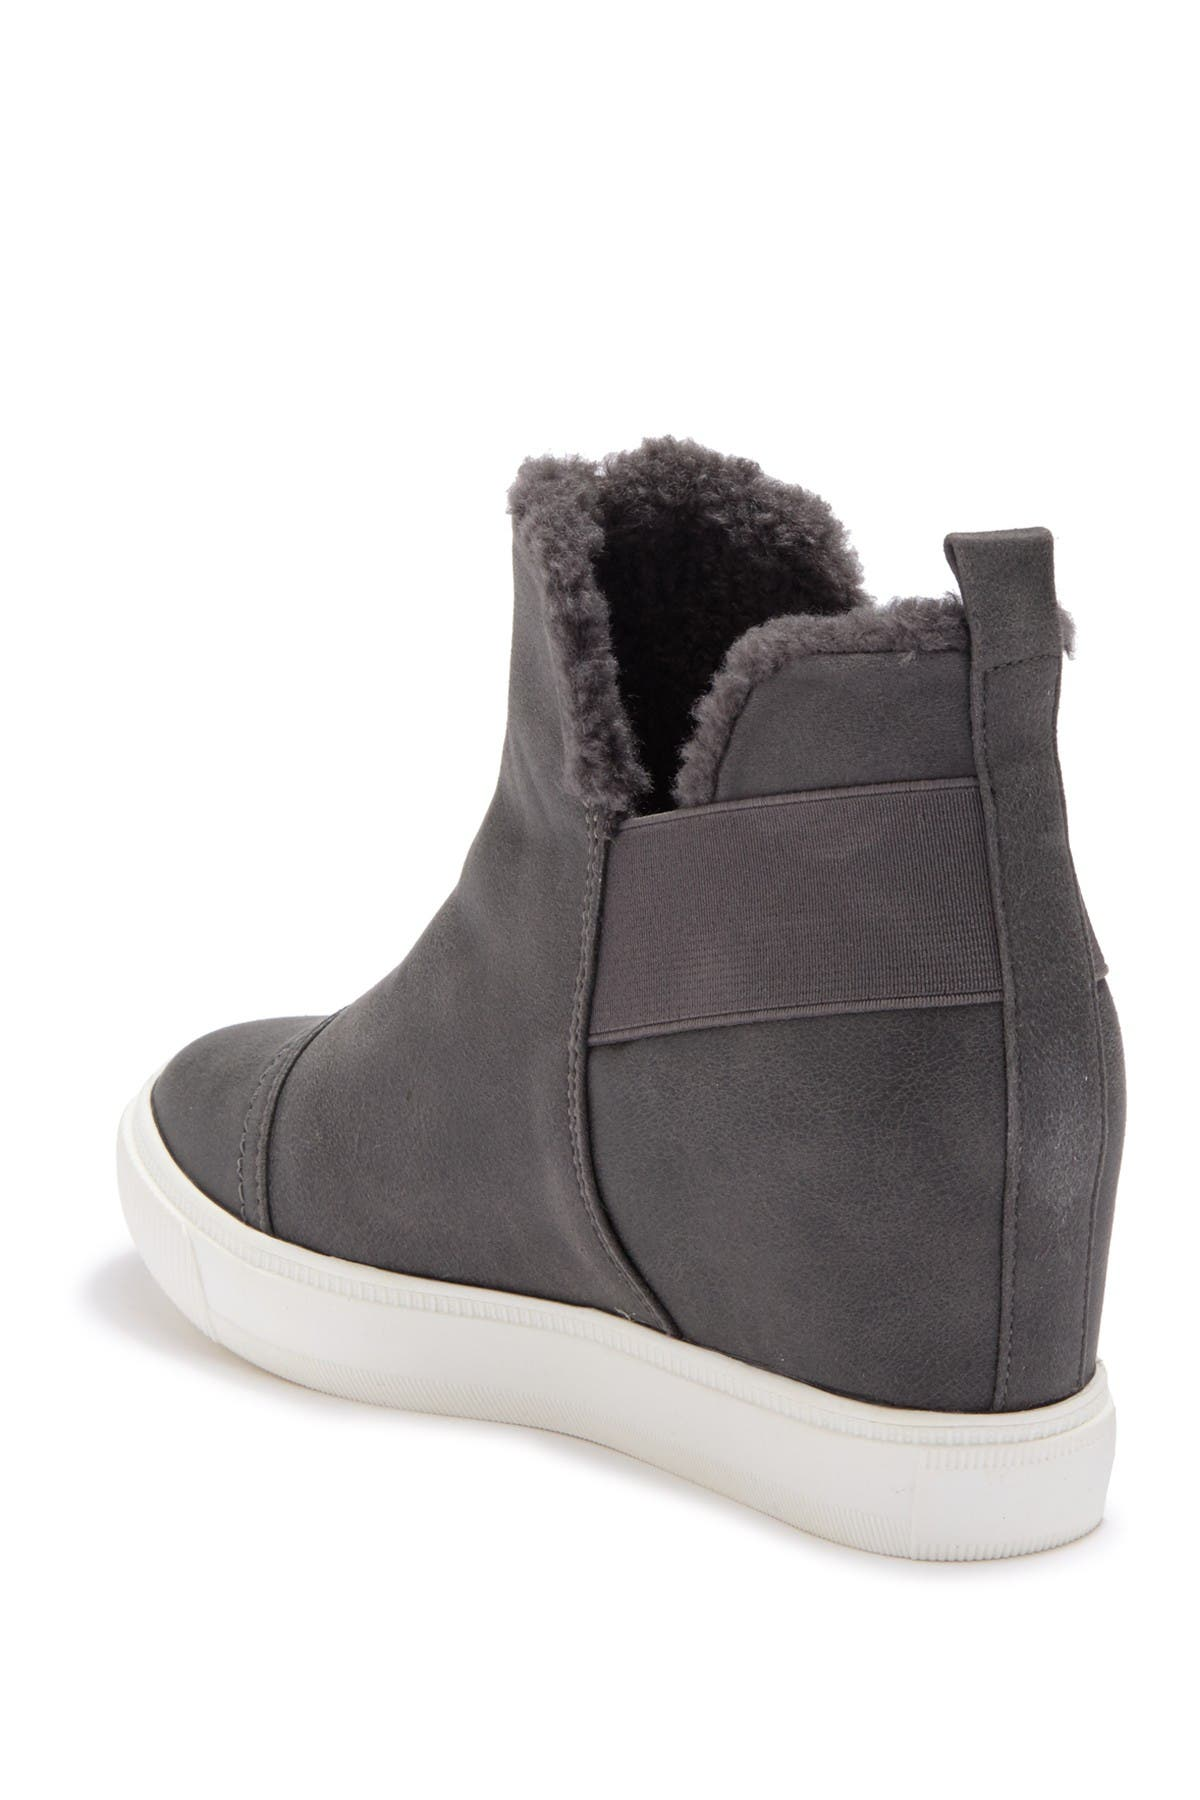 Image of DV DOLCE VITA Kenley Suede & Faux Fur Wedge Sneaker